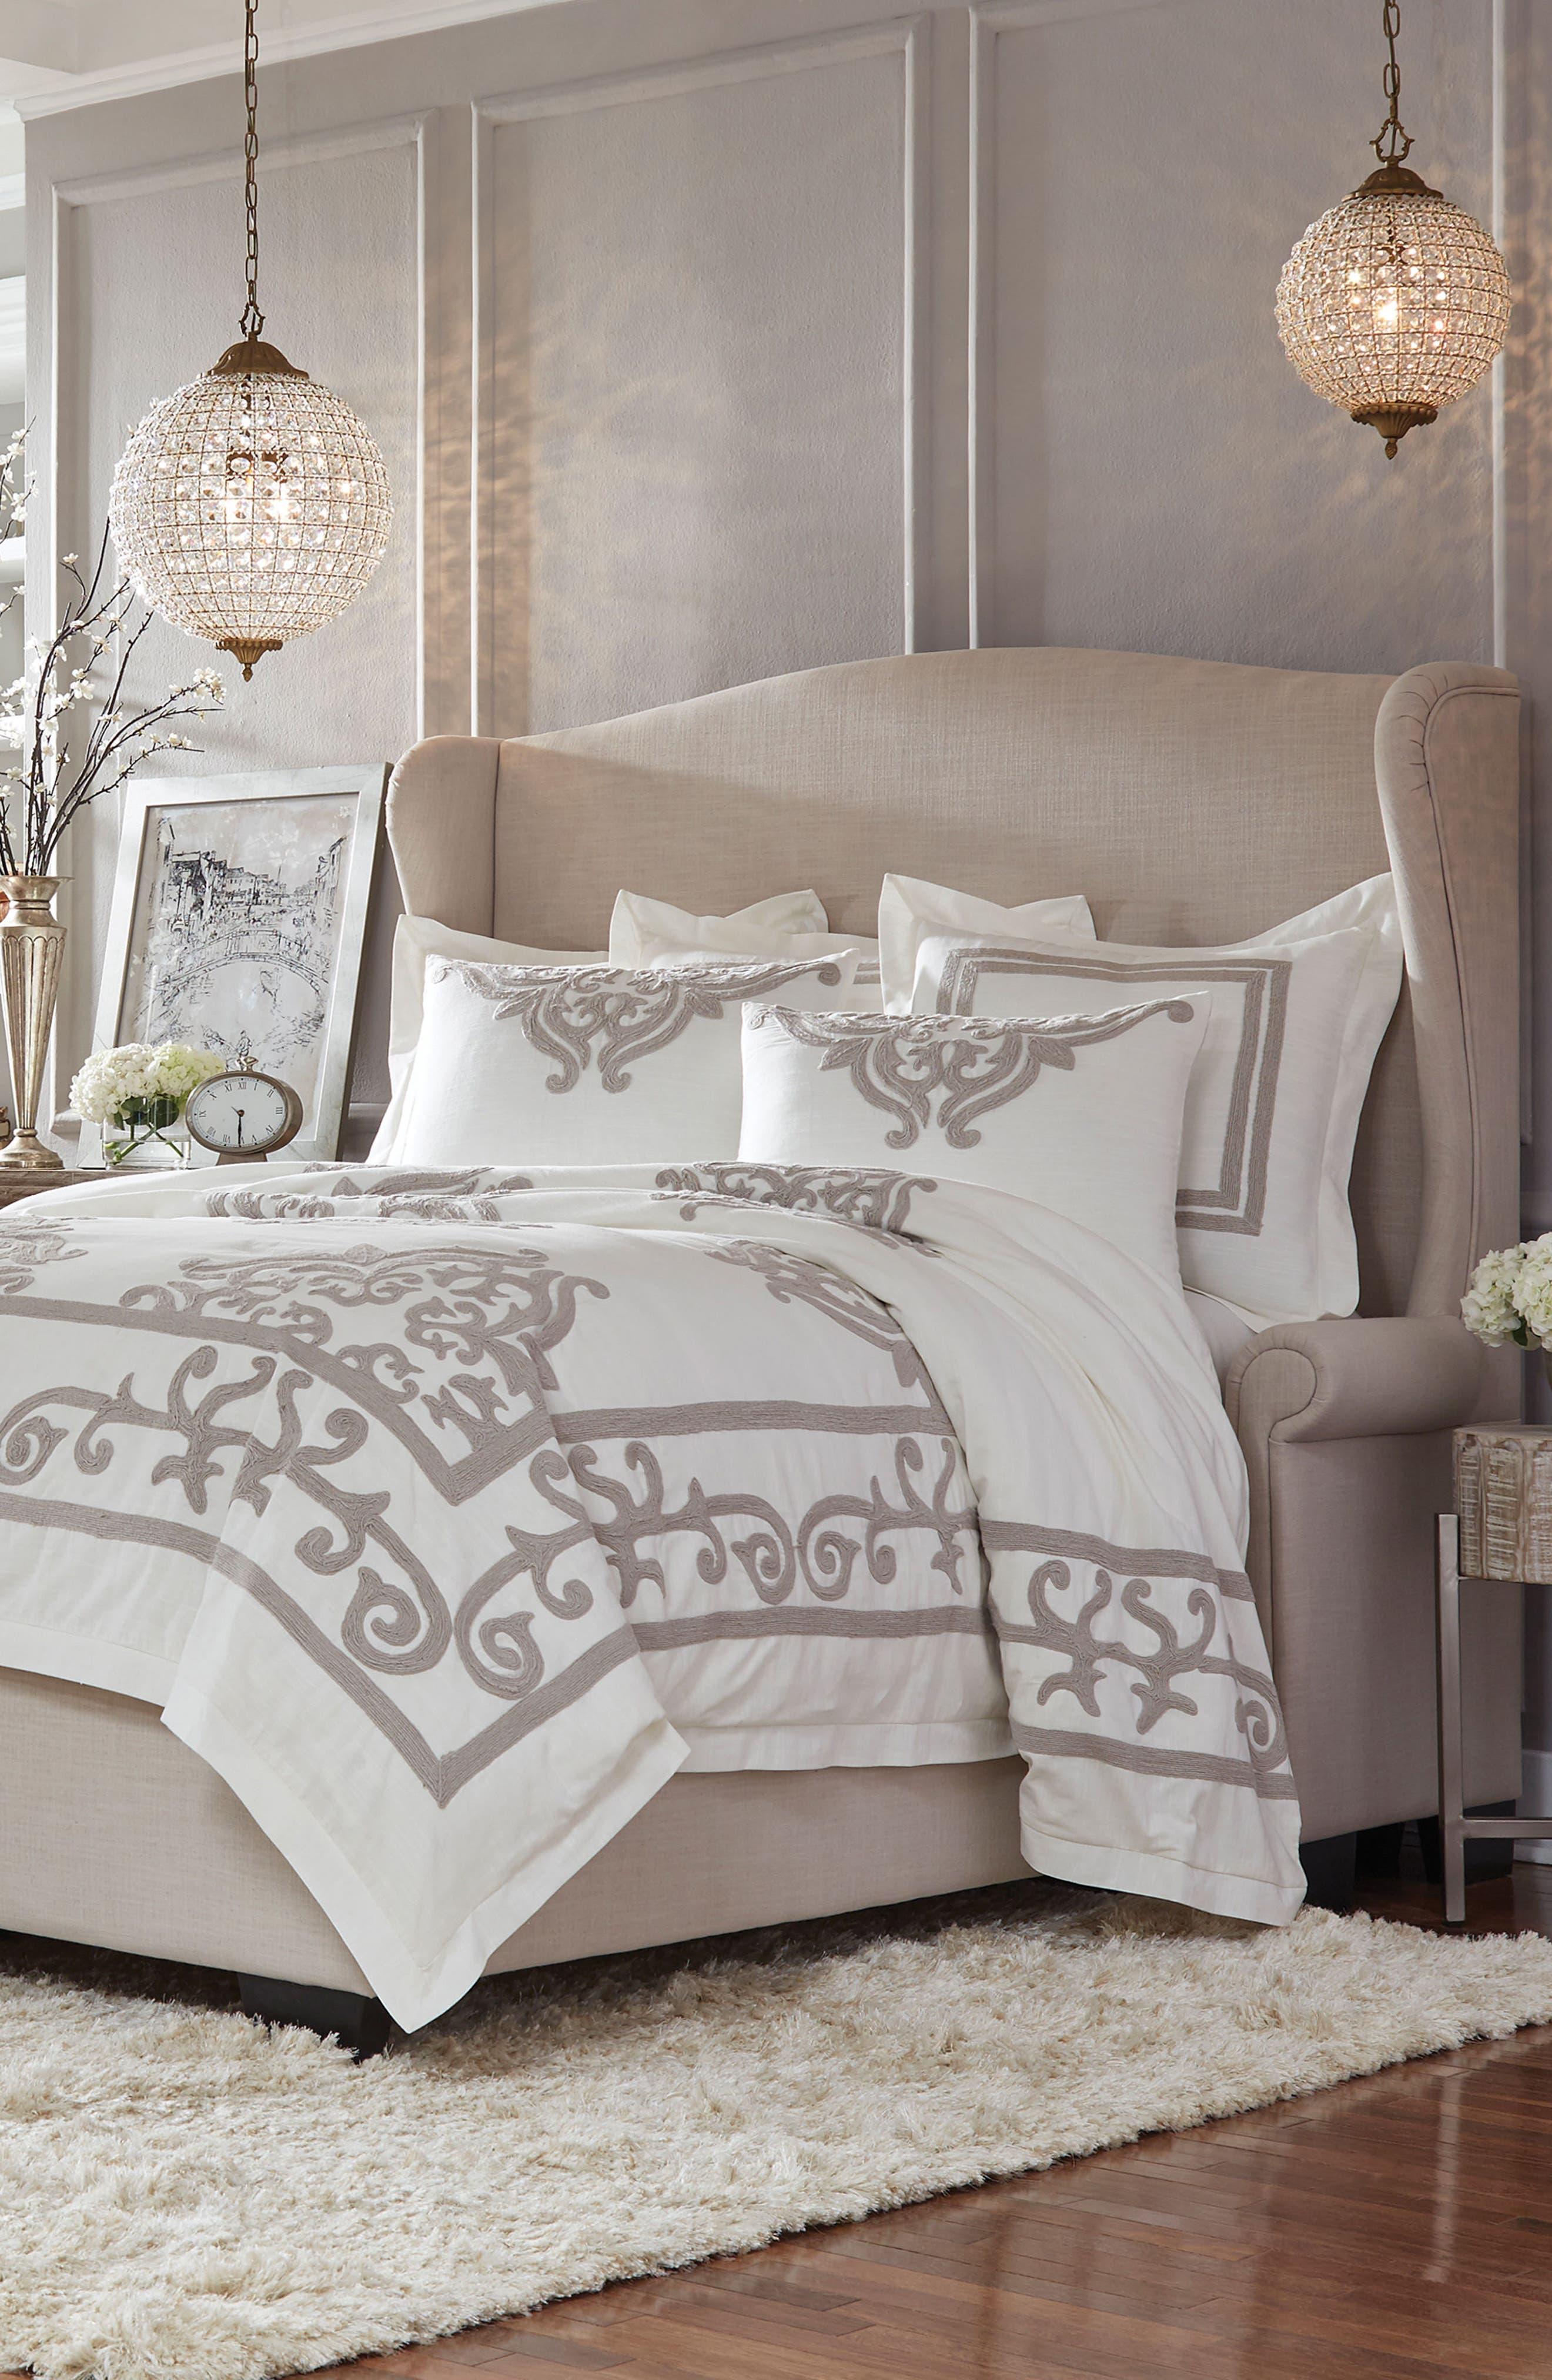 Patrina Embroidered Duvet Cover, IVORY/ TAUPE, christine kohut interiors, designninja, bedding, winter white out, sale, nordstrom